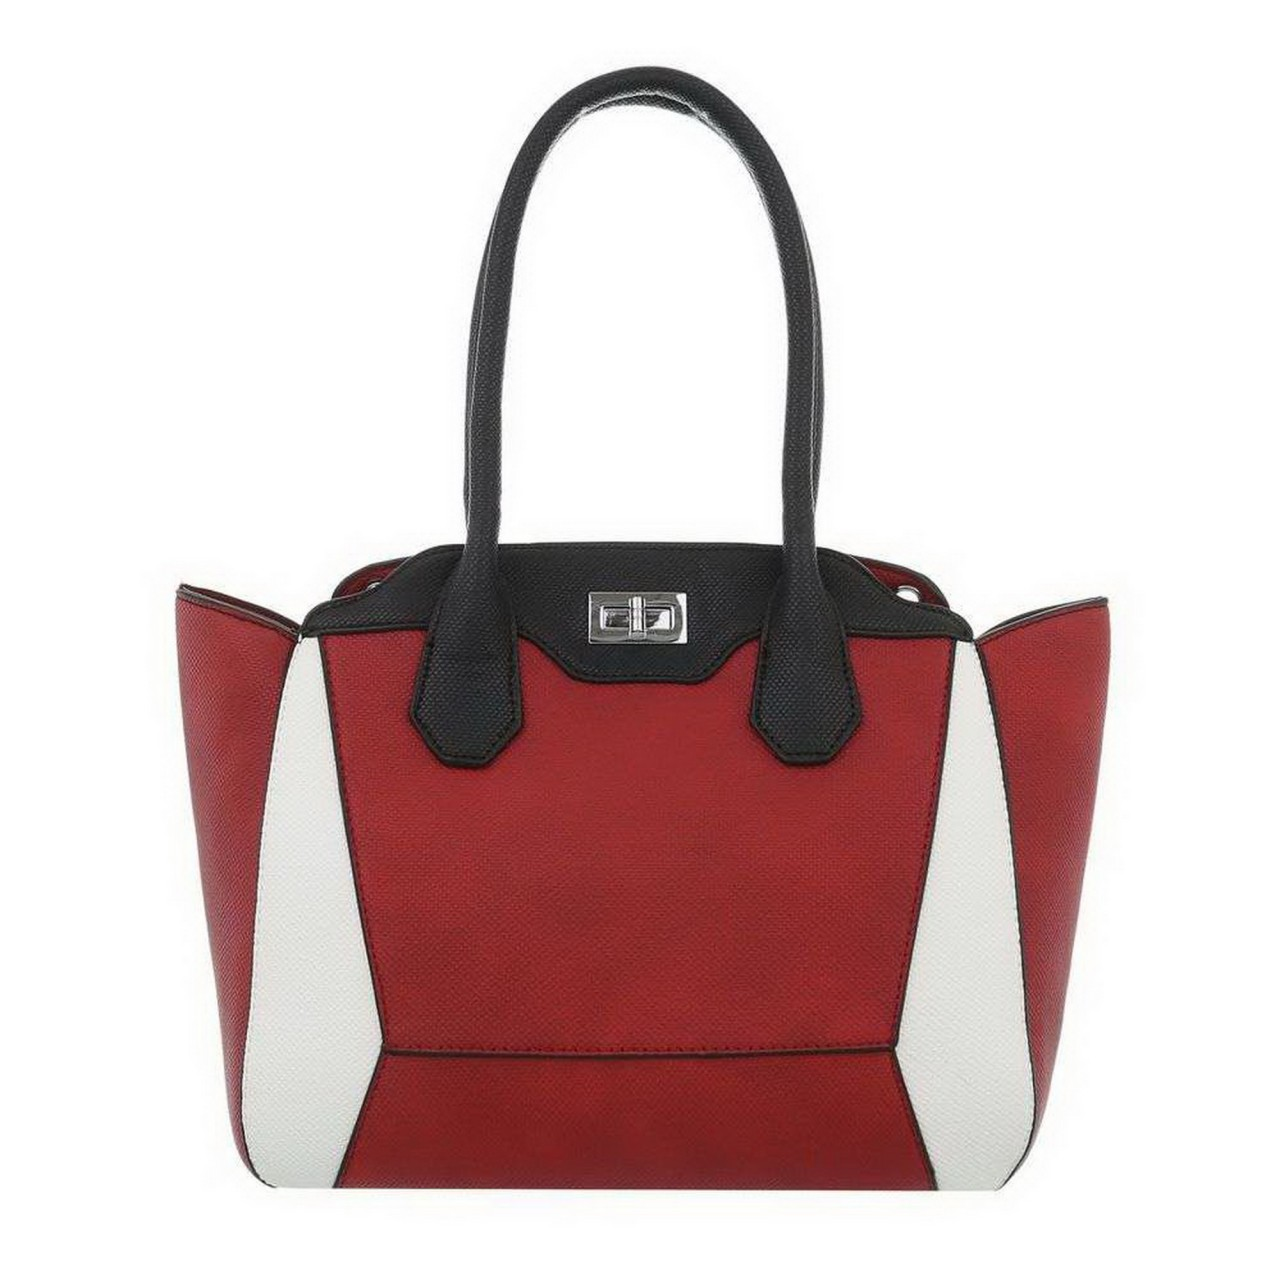 Damen Handtasche-red